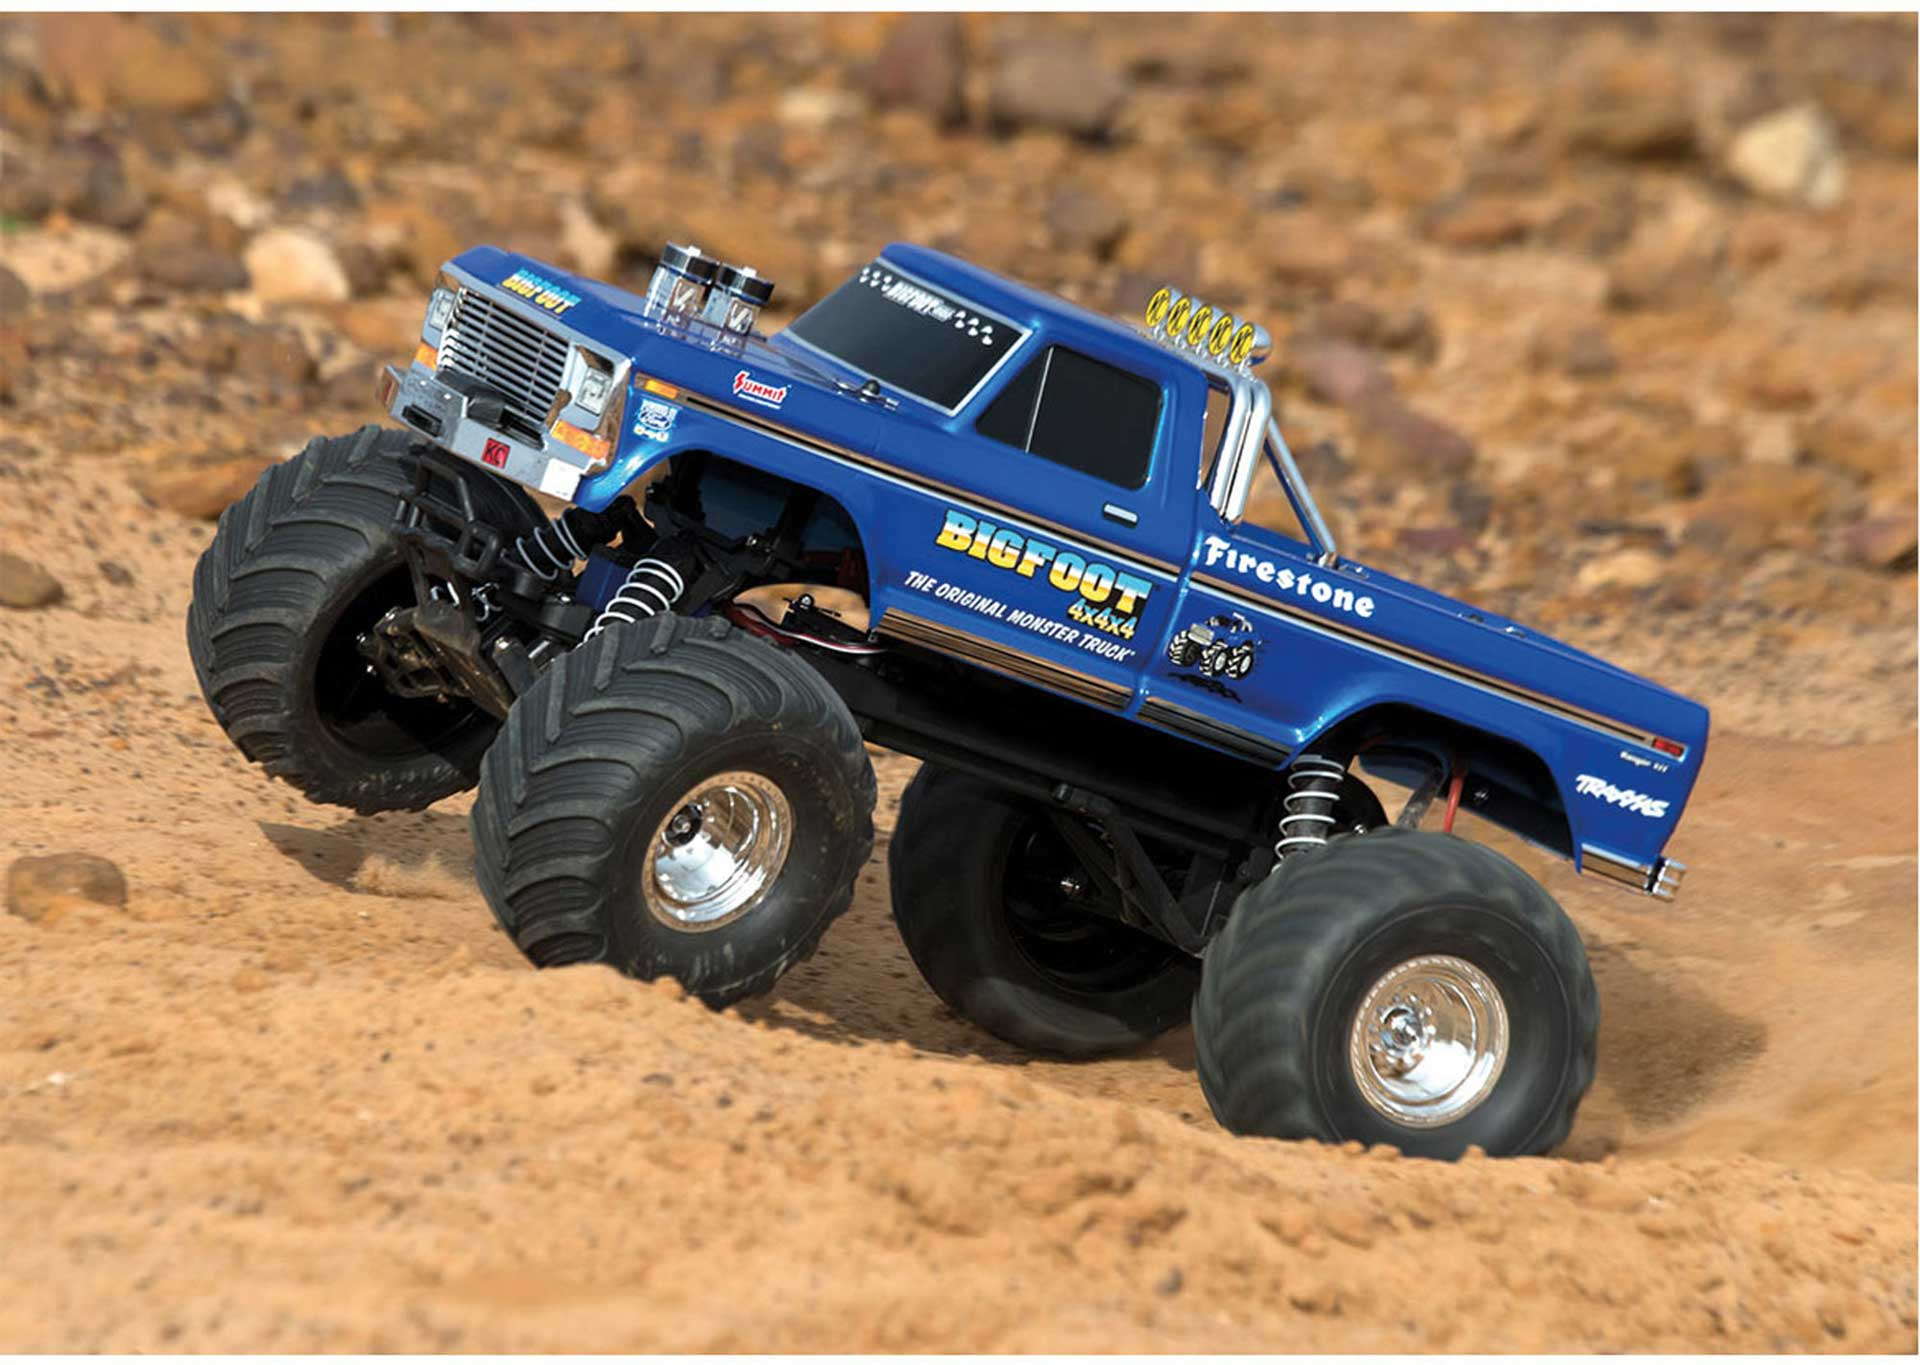 TRAXXAS BIGFOOT NO.1 MONSTERTRUCK RTR +12V-LADER 1/10 2WD